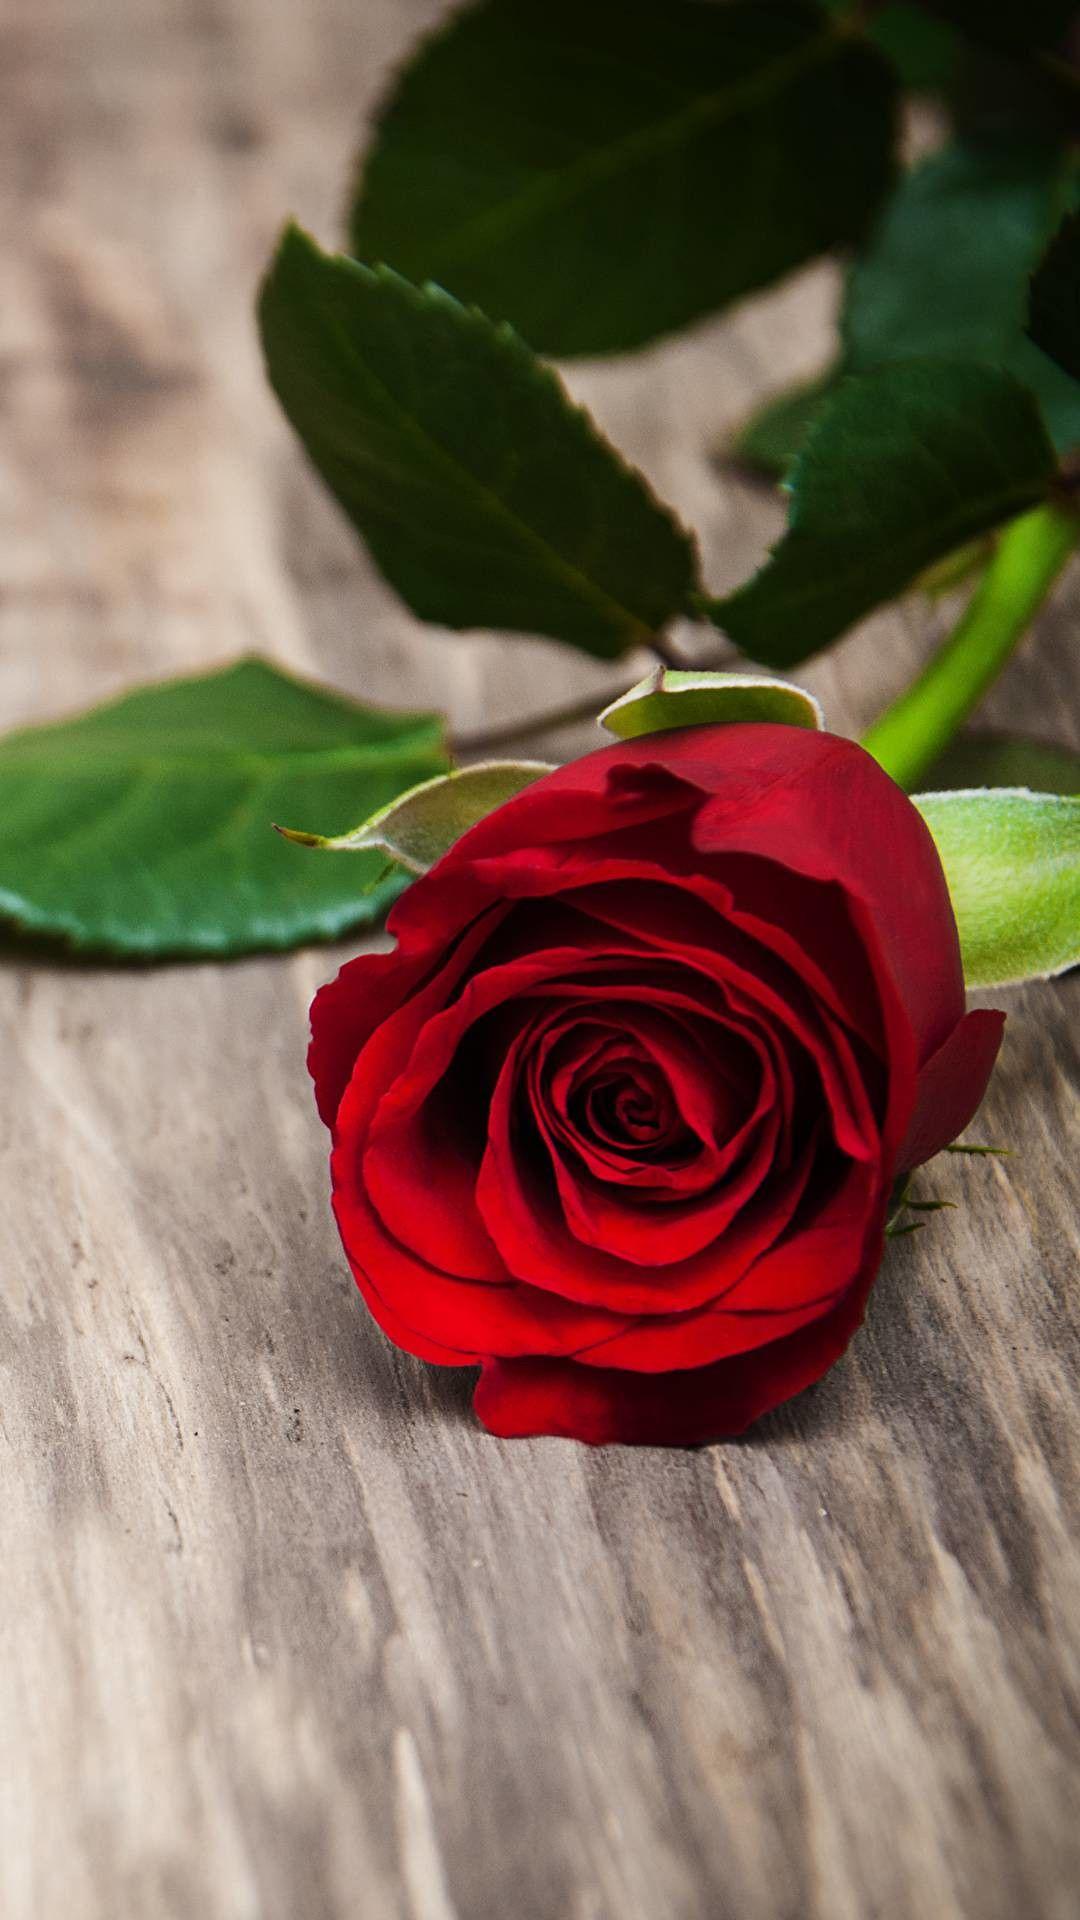 Flower Love Rose Flower Beautiful Rose Flowers Rose Flower Wallpaper